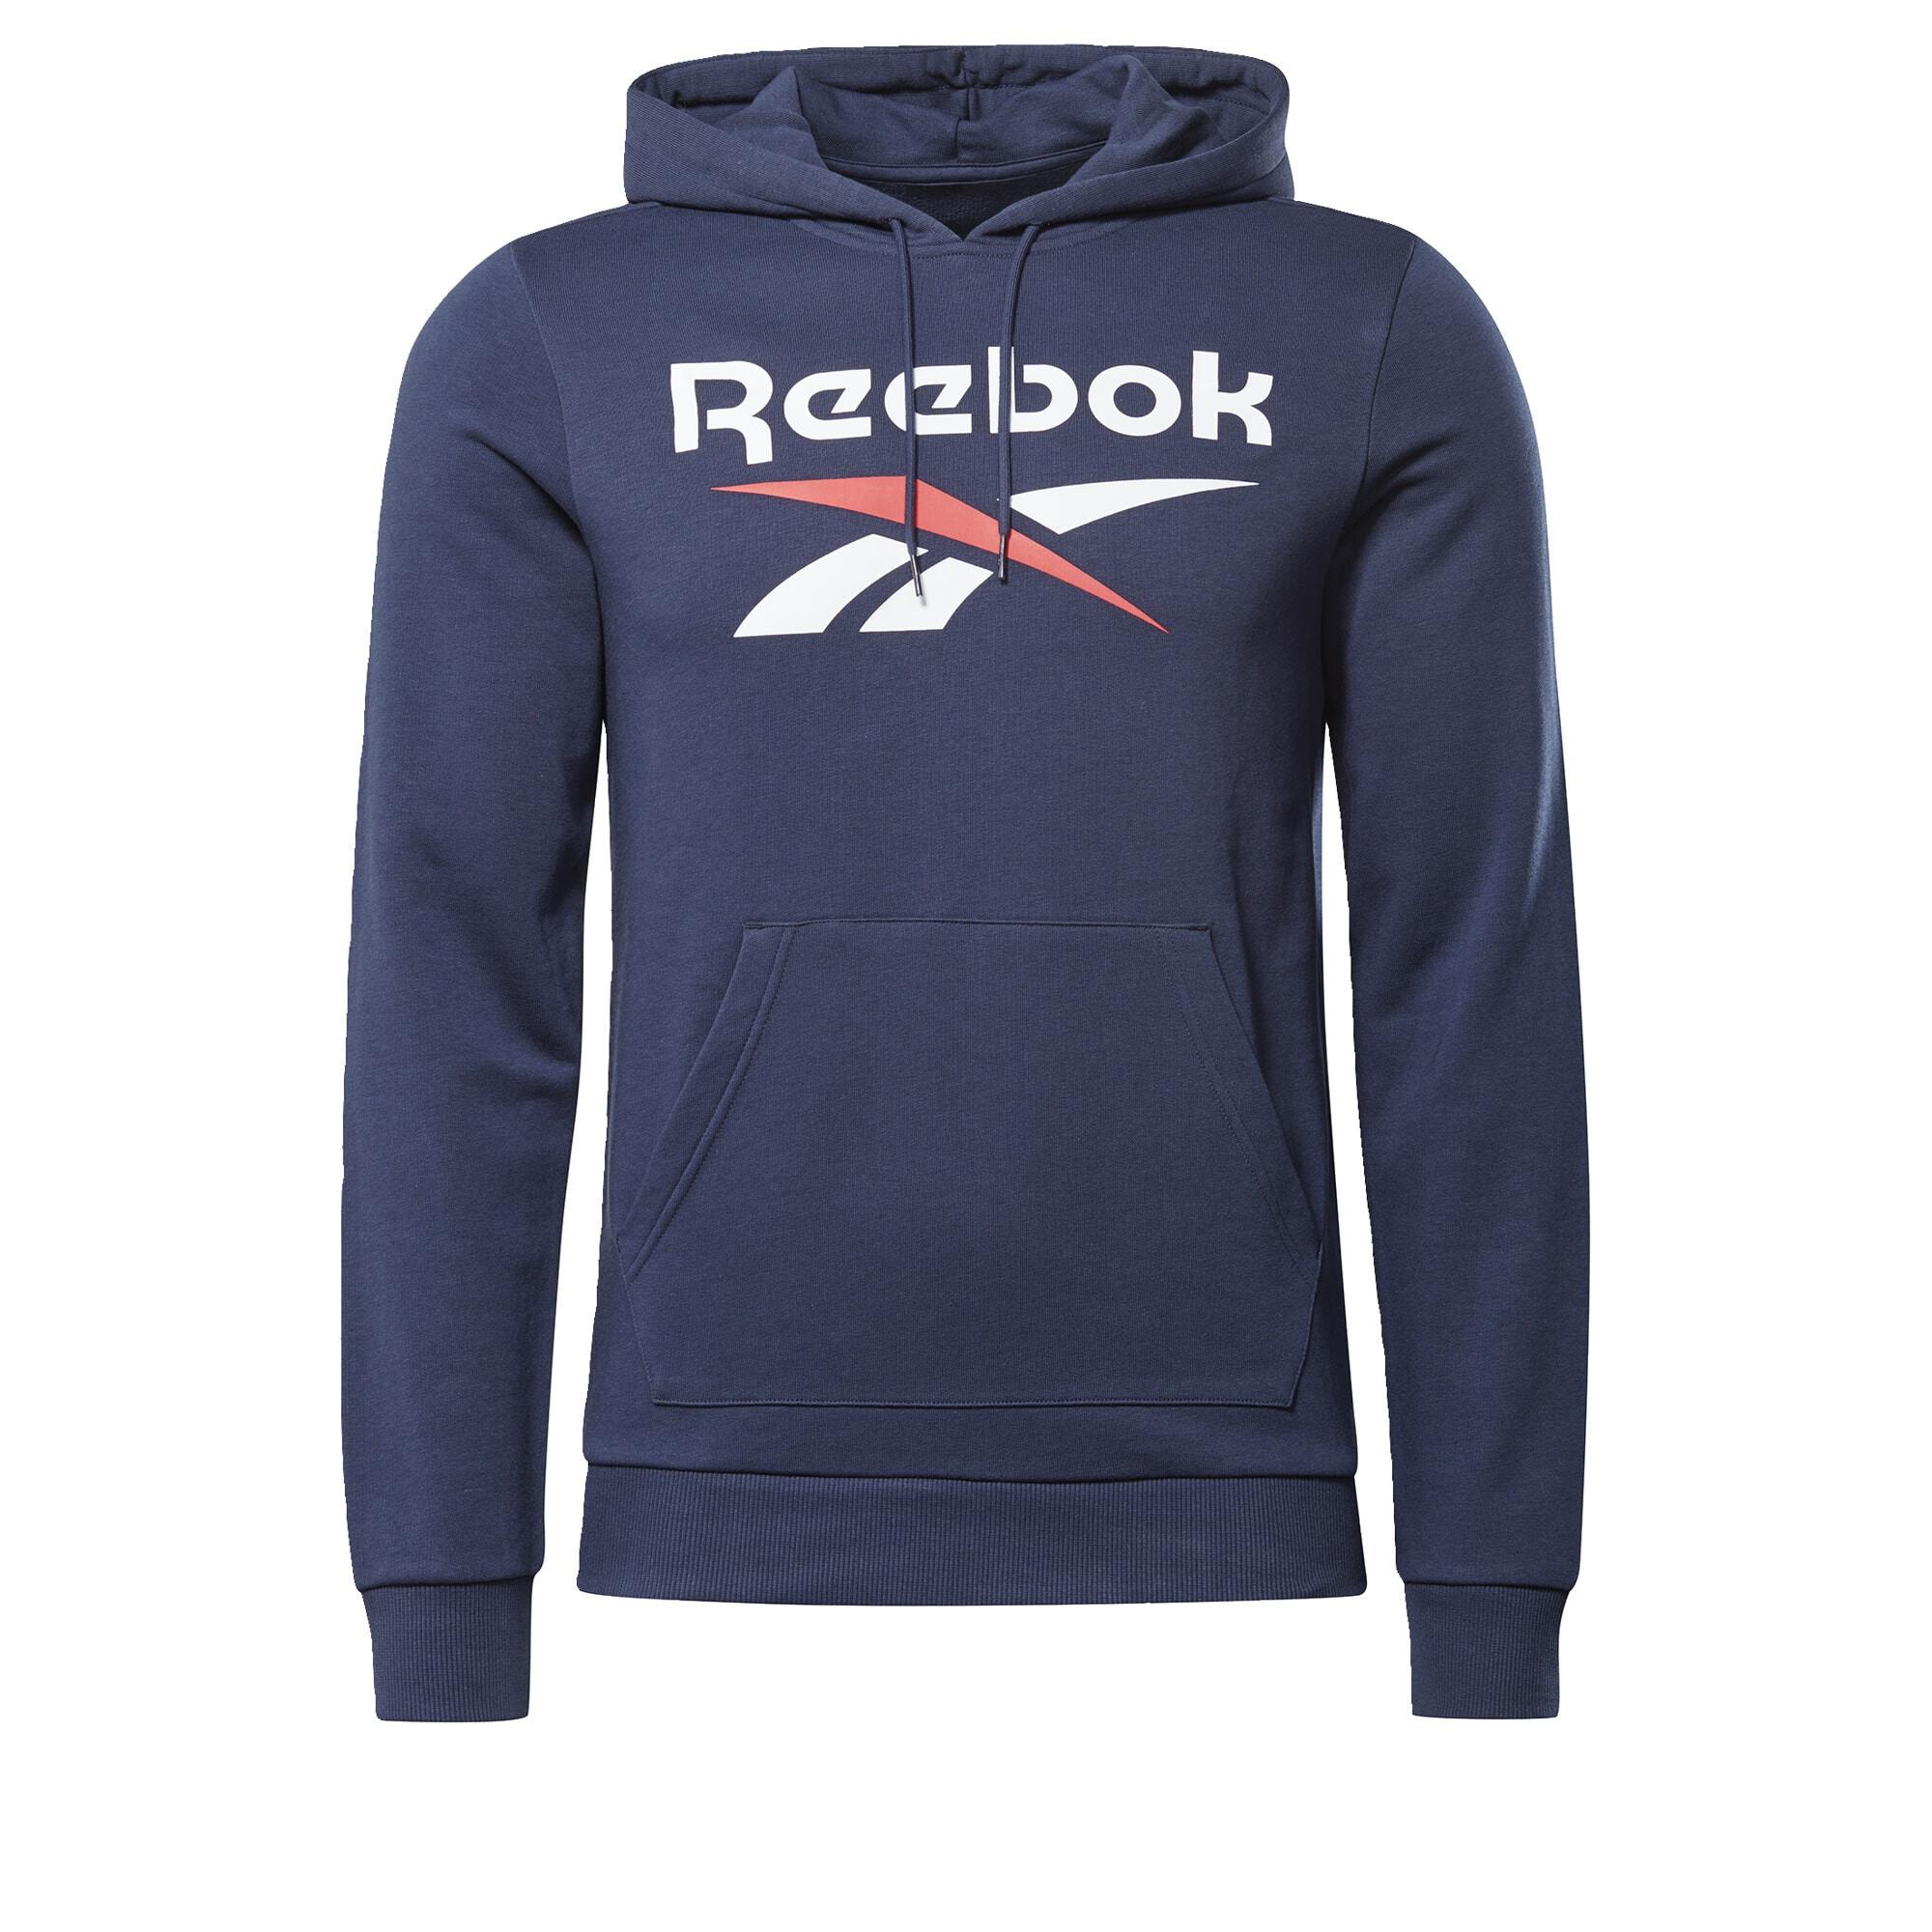 Reebok Classic Sportinio tipo megztinis tamsiai mėlyna / balta / raudona